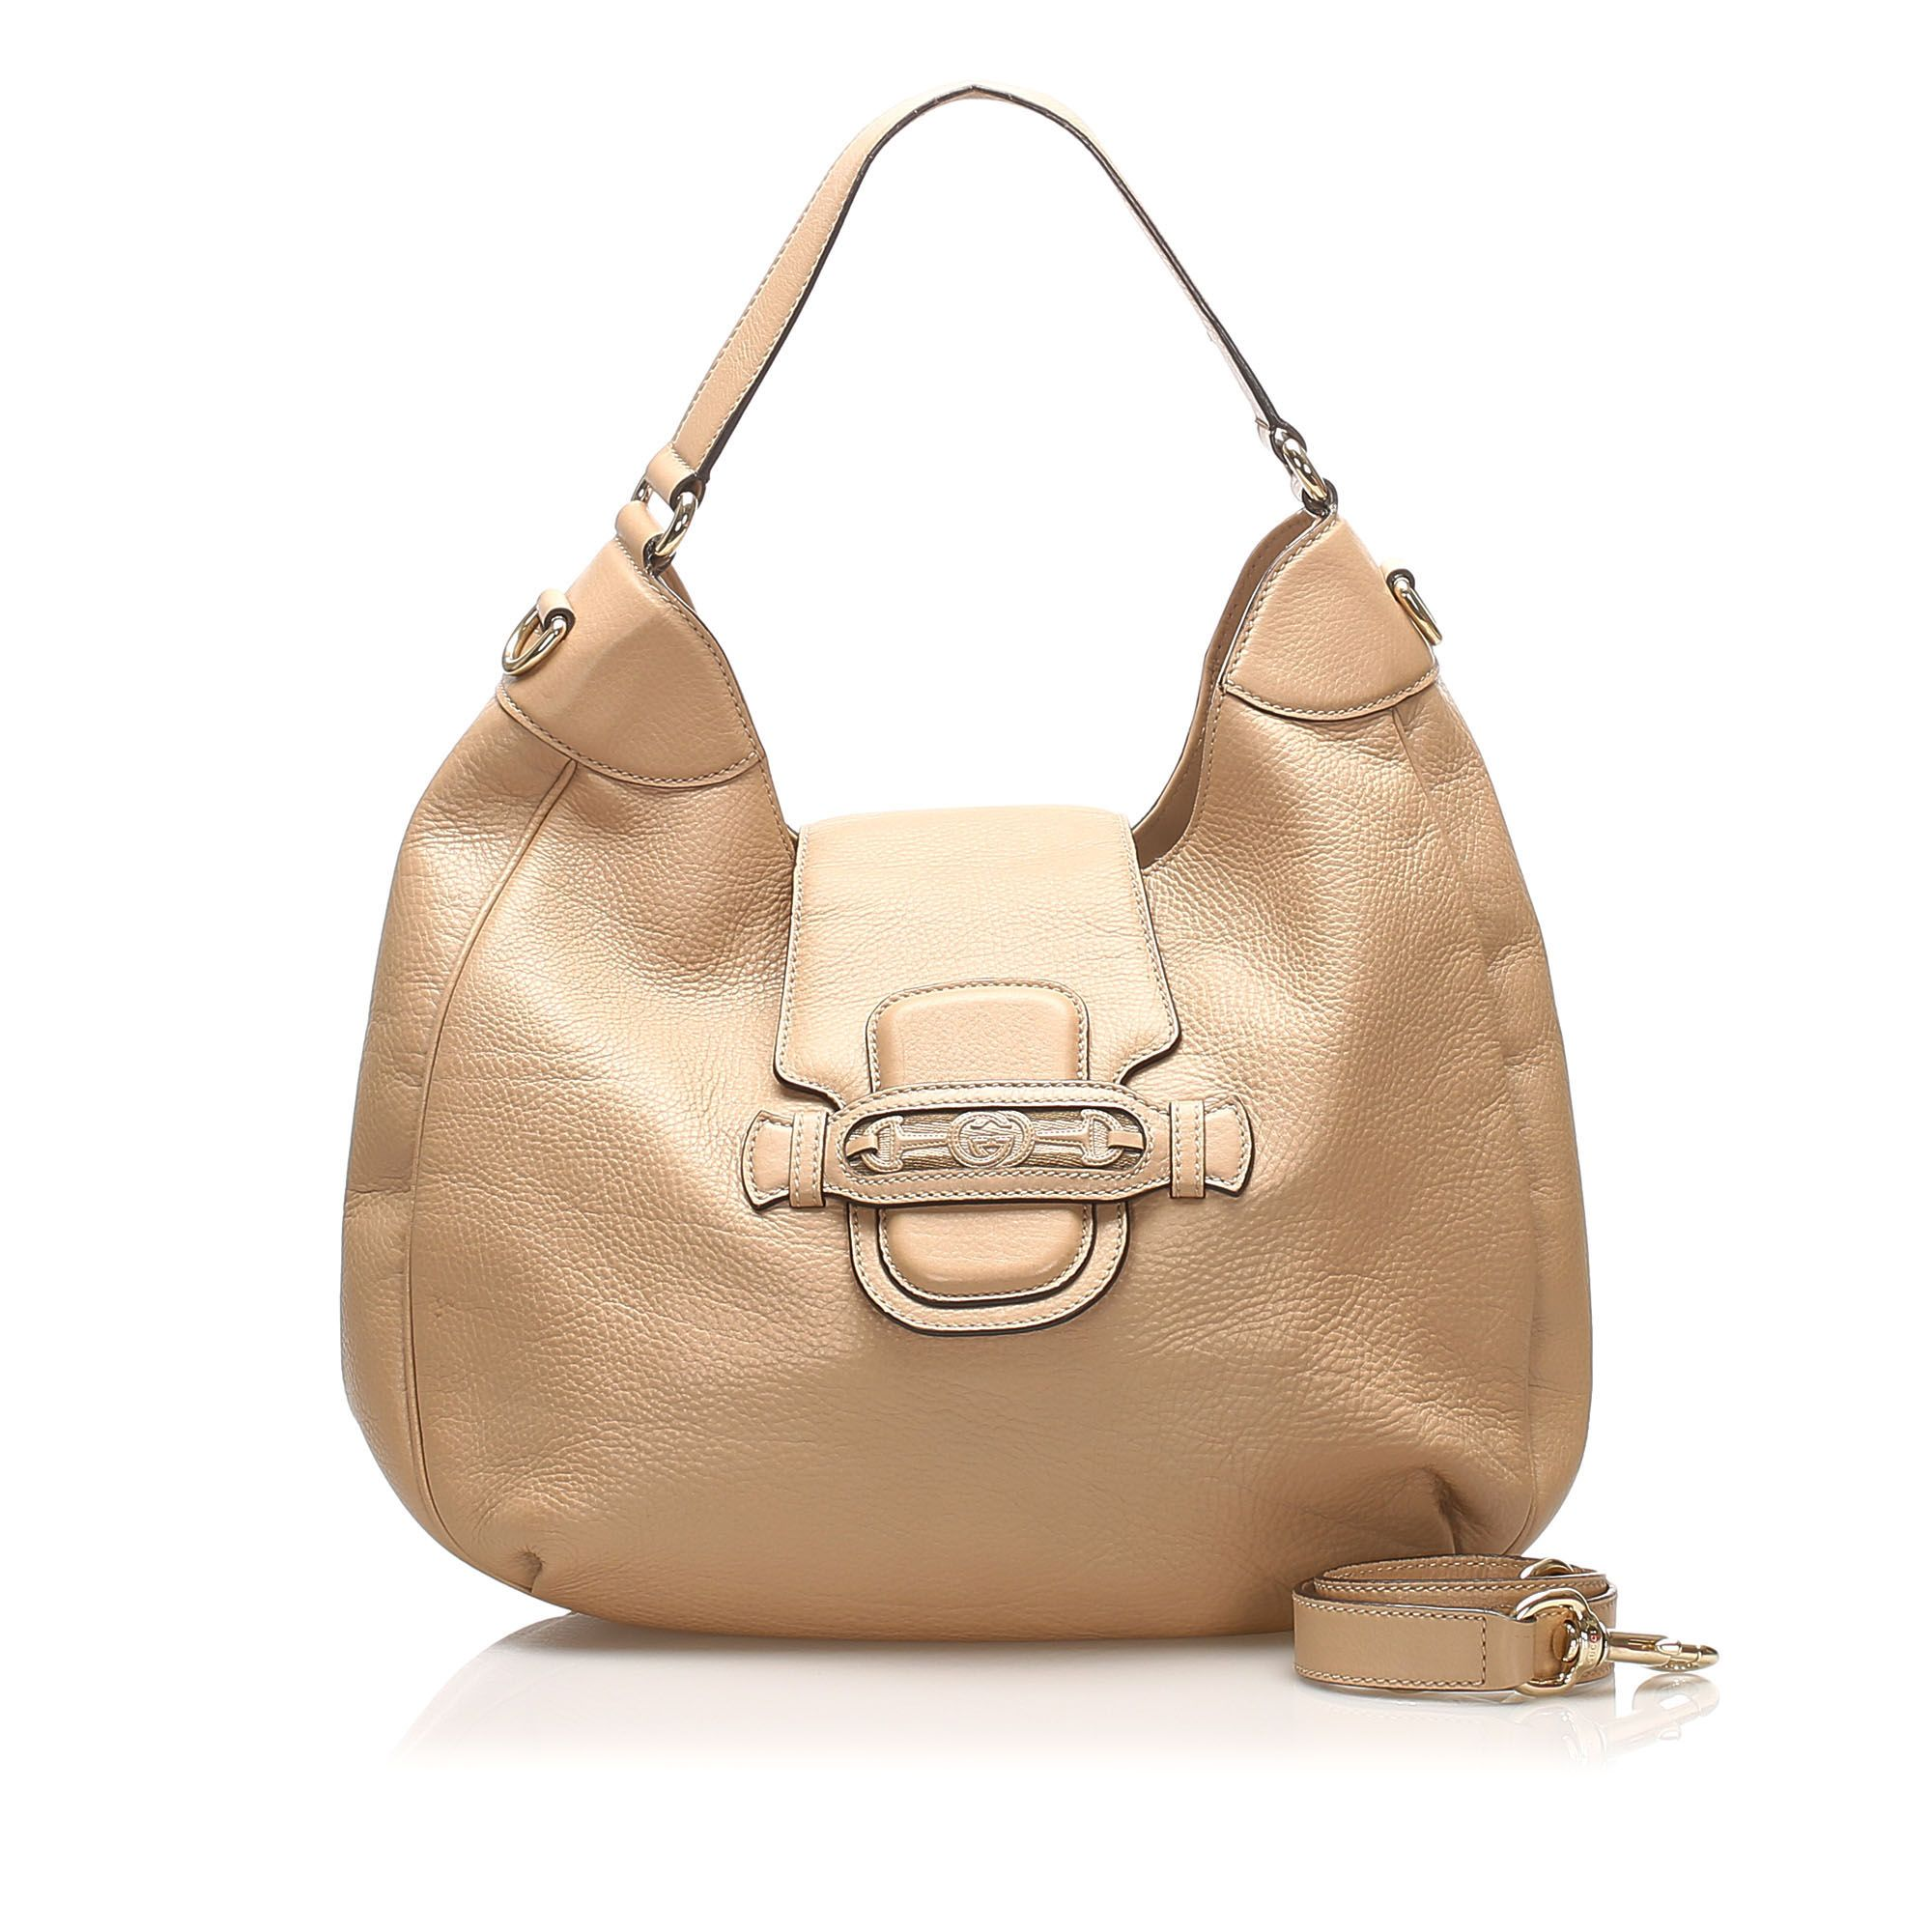 Vintage Gucci Leather Satchel Brown